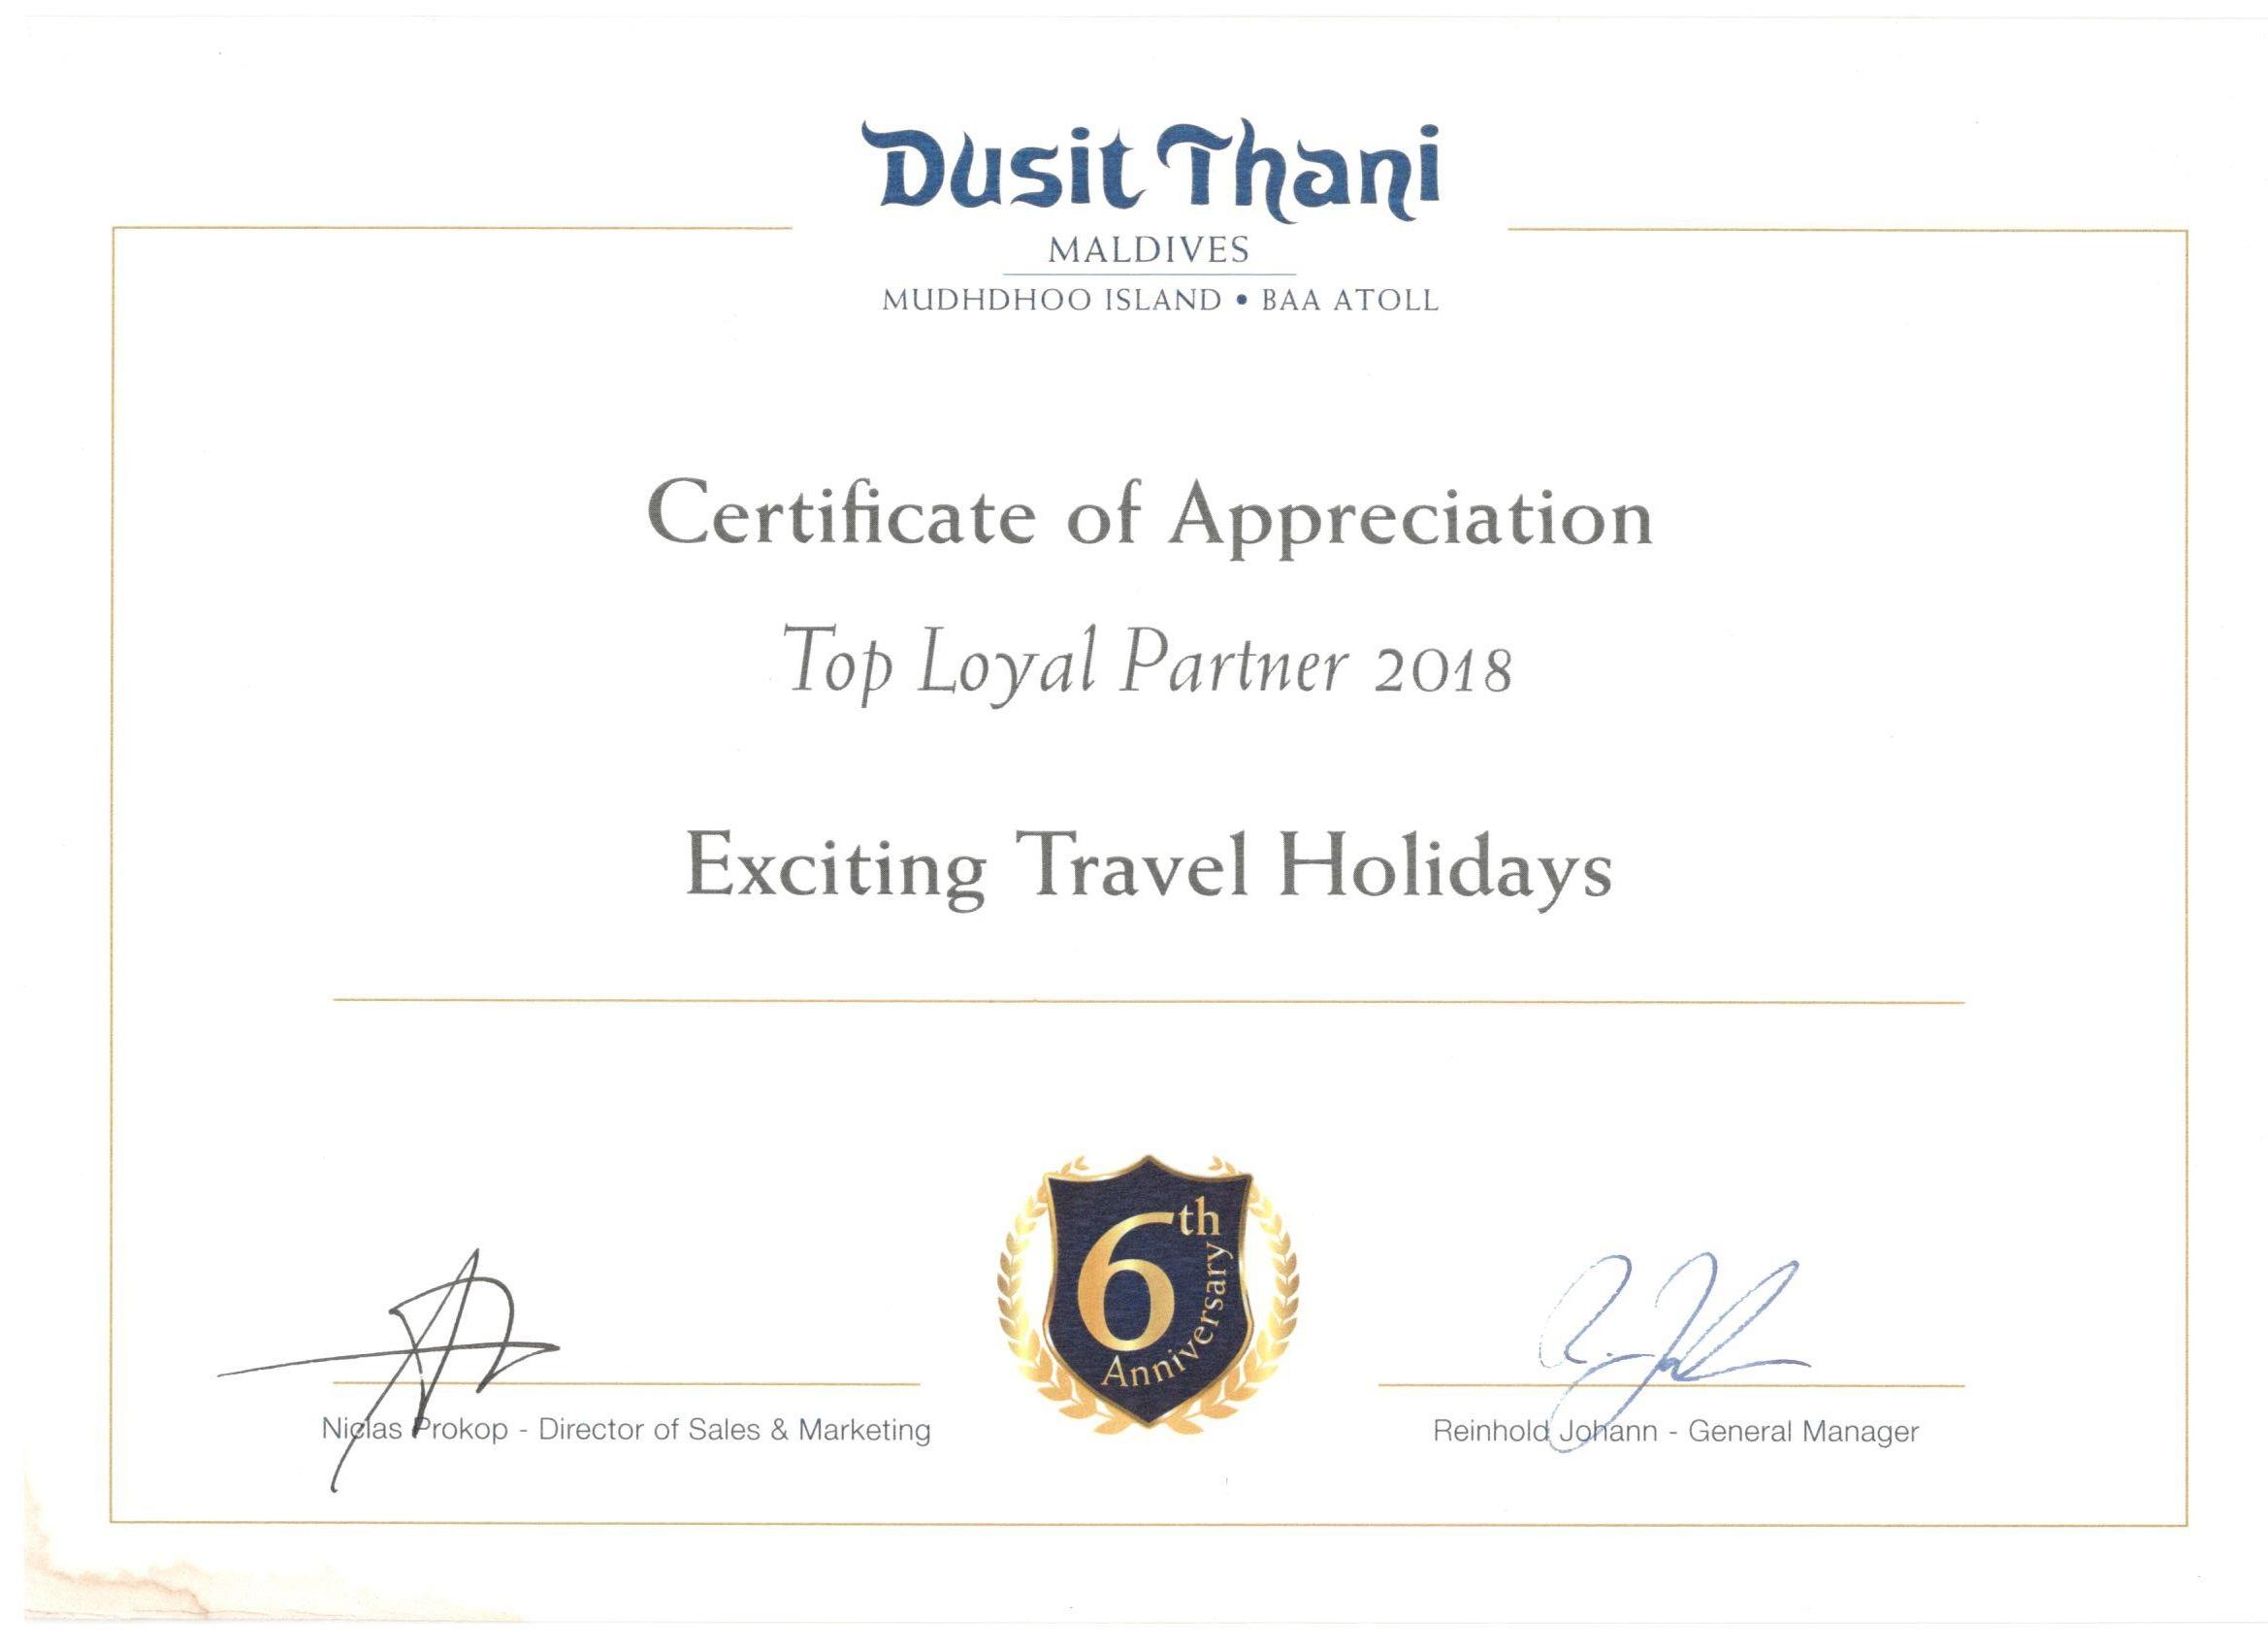 Dusit Thani certificate.jpg